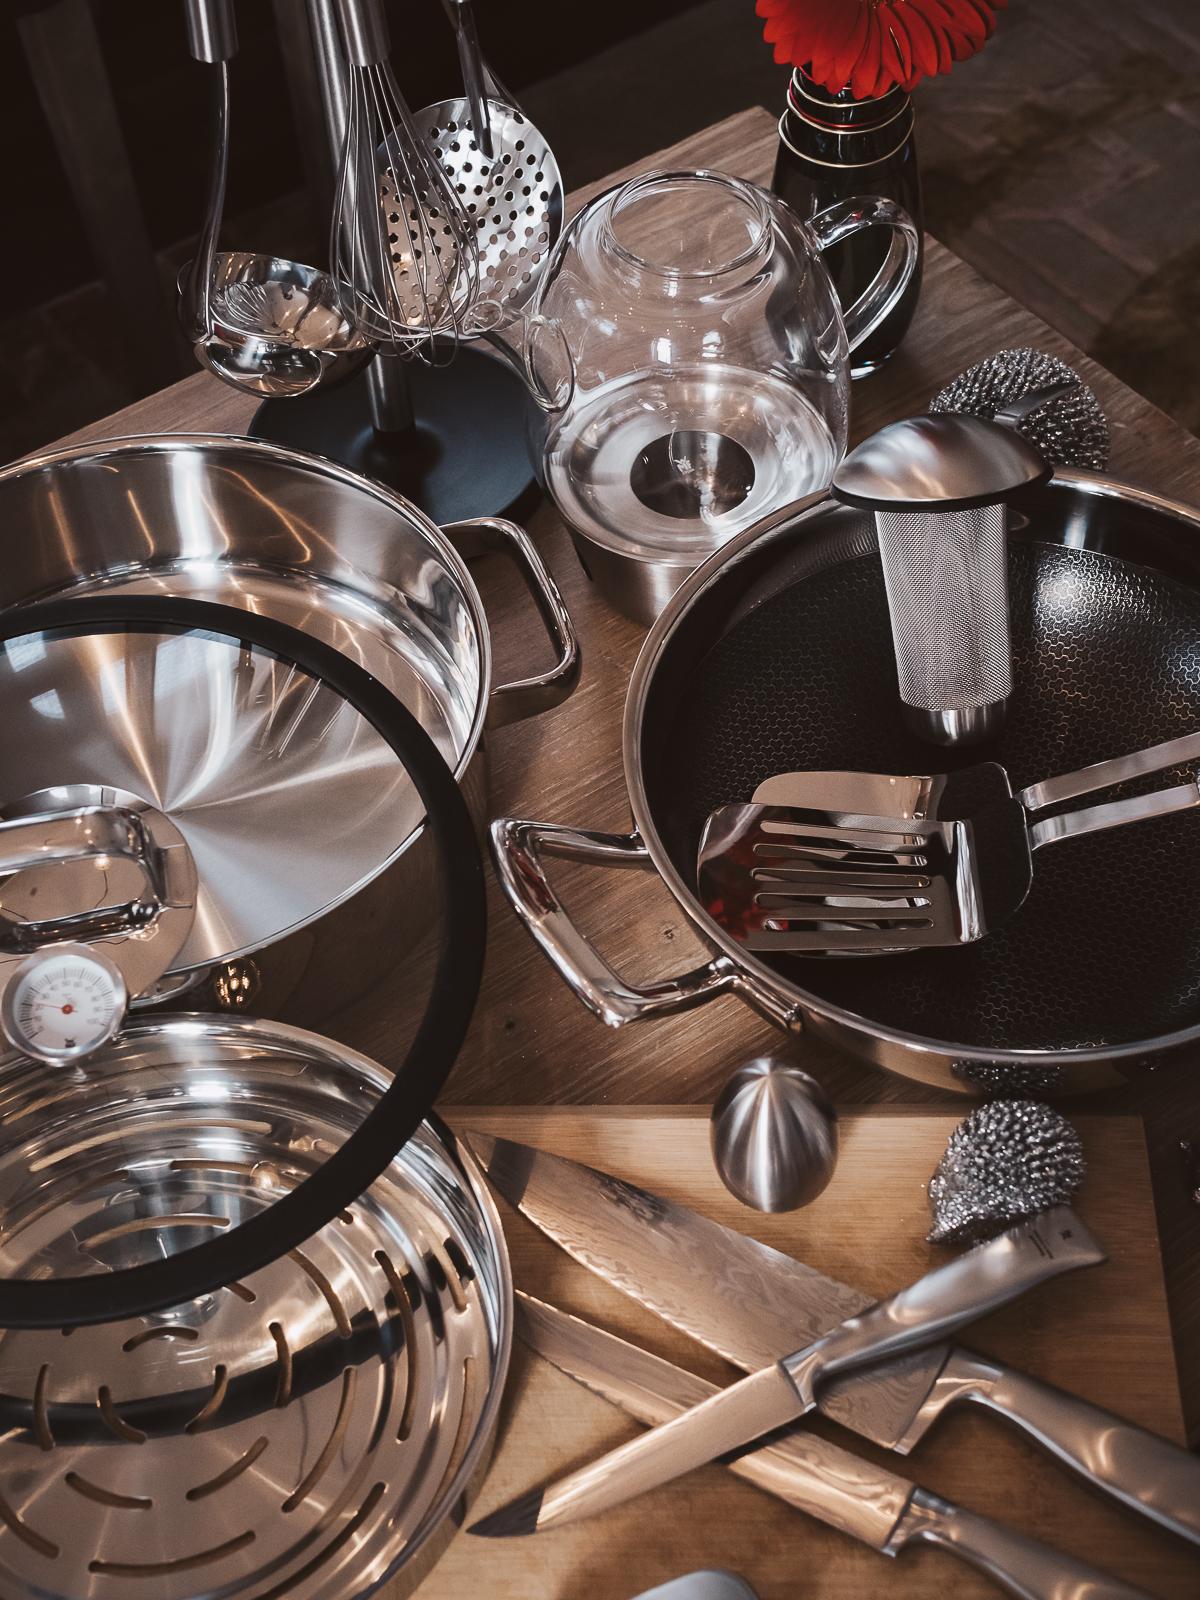 Ingolstadt Village Chinese New Year Lifestyle Shopping & Home Cooking - Olympus EM1Markii 2512 - Yes! Please Enjoy by Fanning Tseng-72.jpg